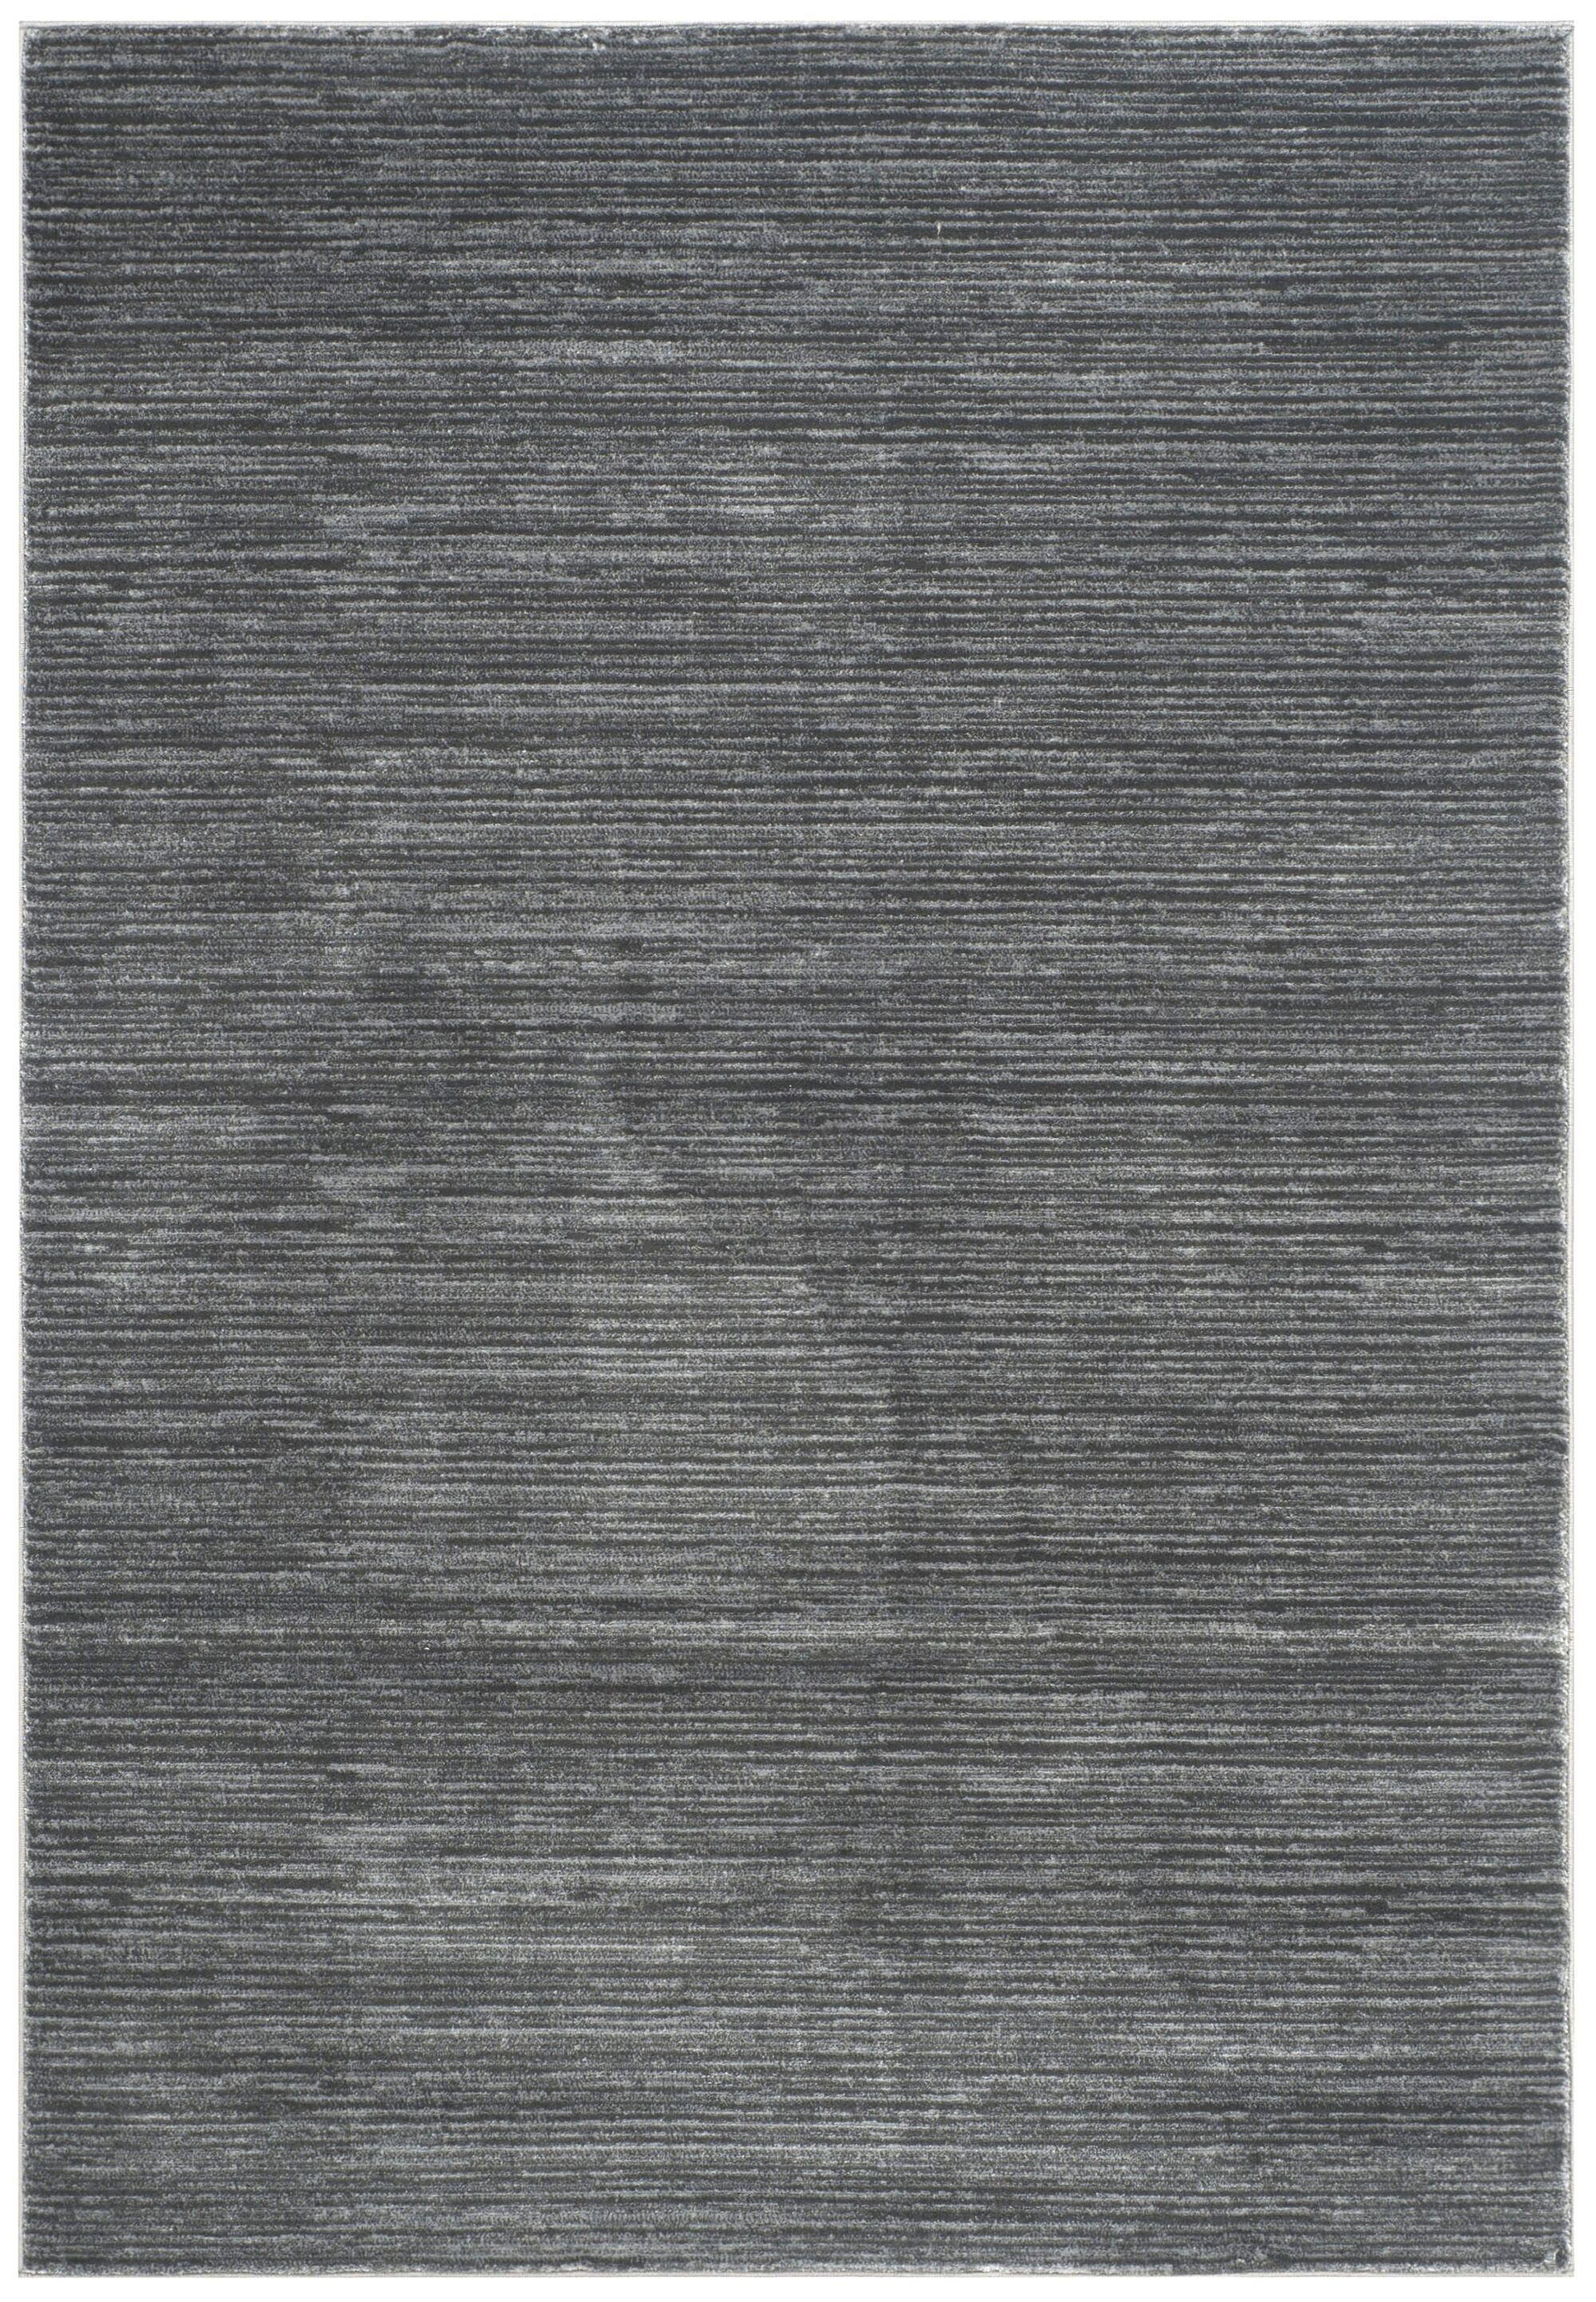 Harloe Gray Area Rug Rug Size: Rectangle 6' x 9'